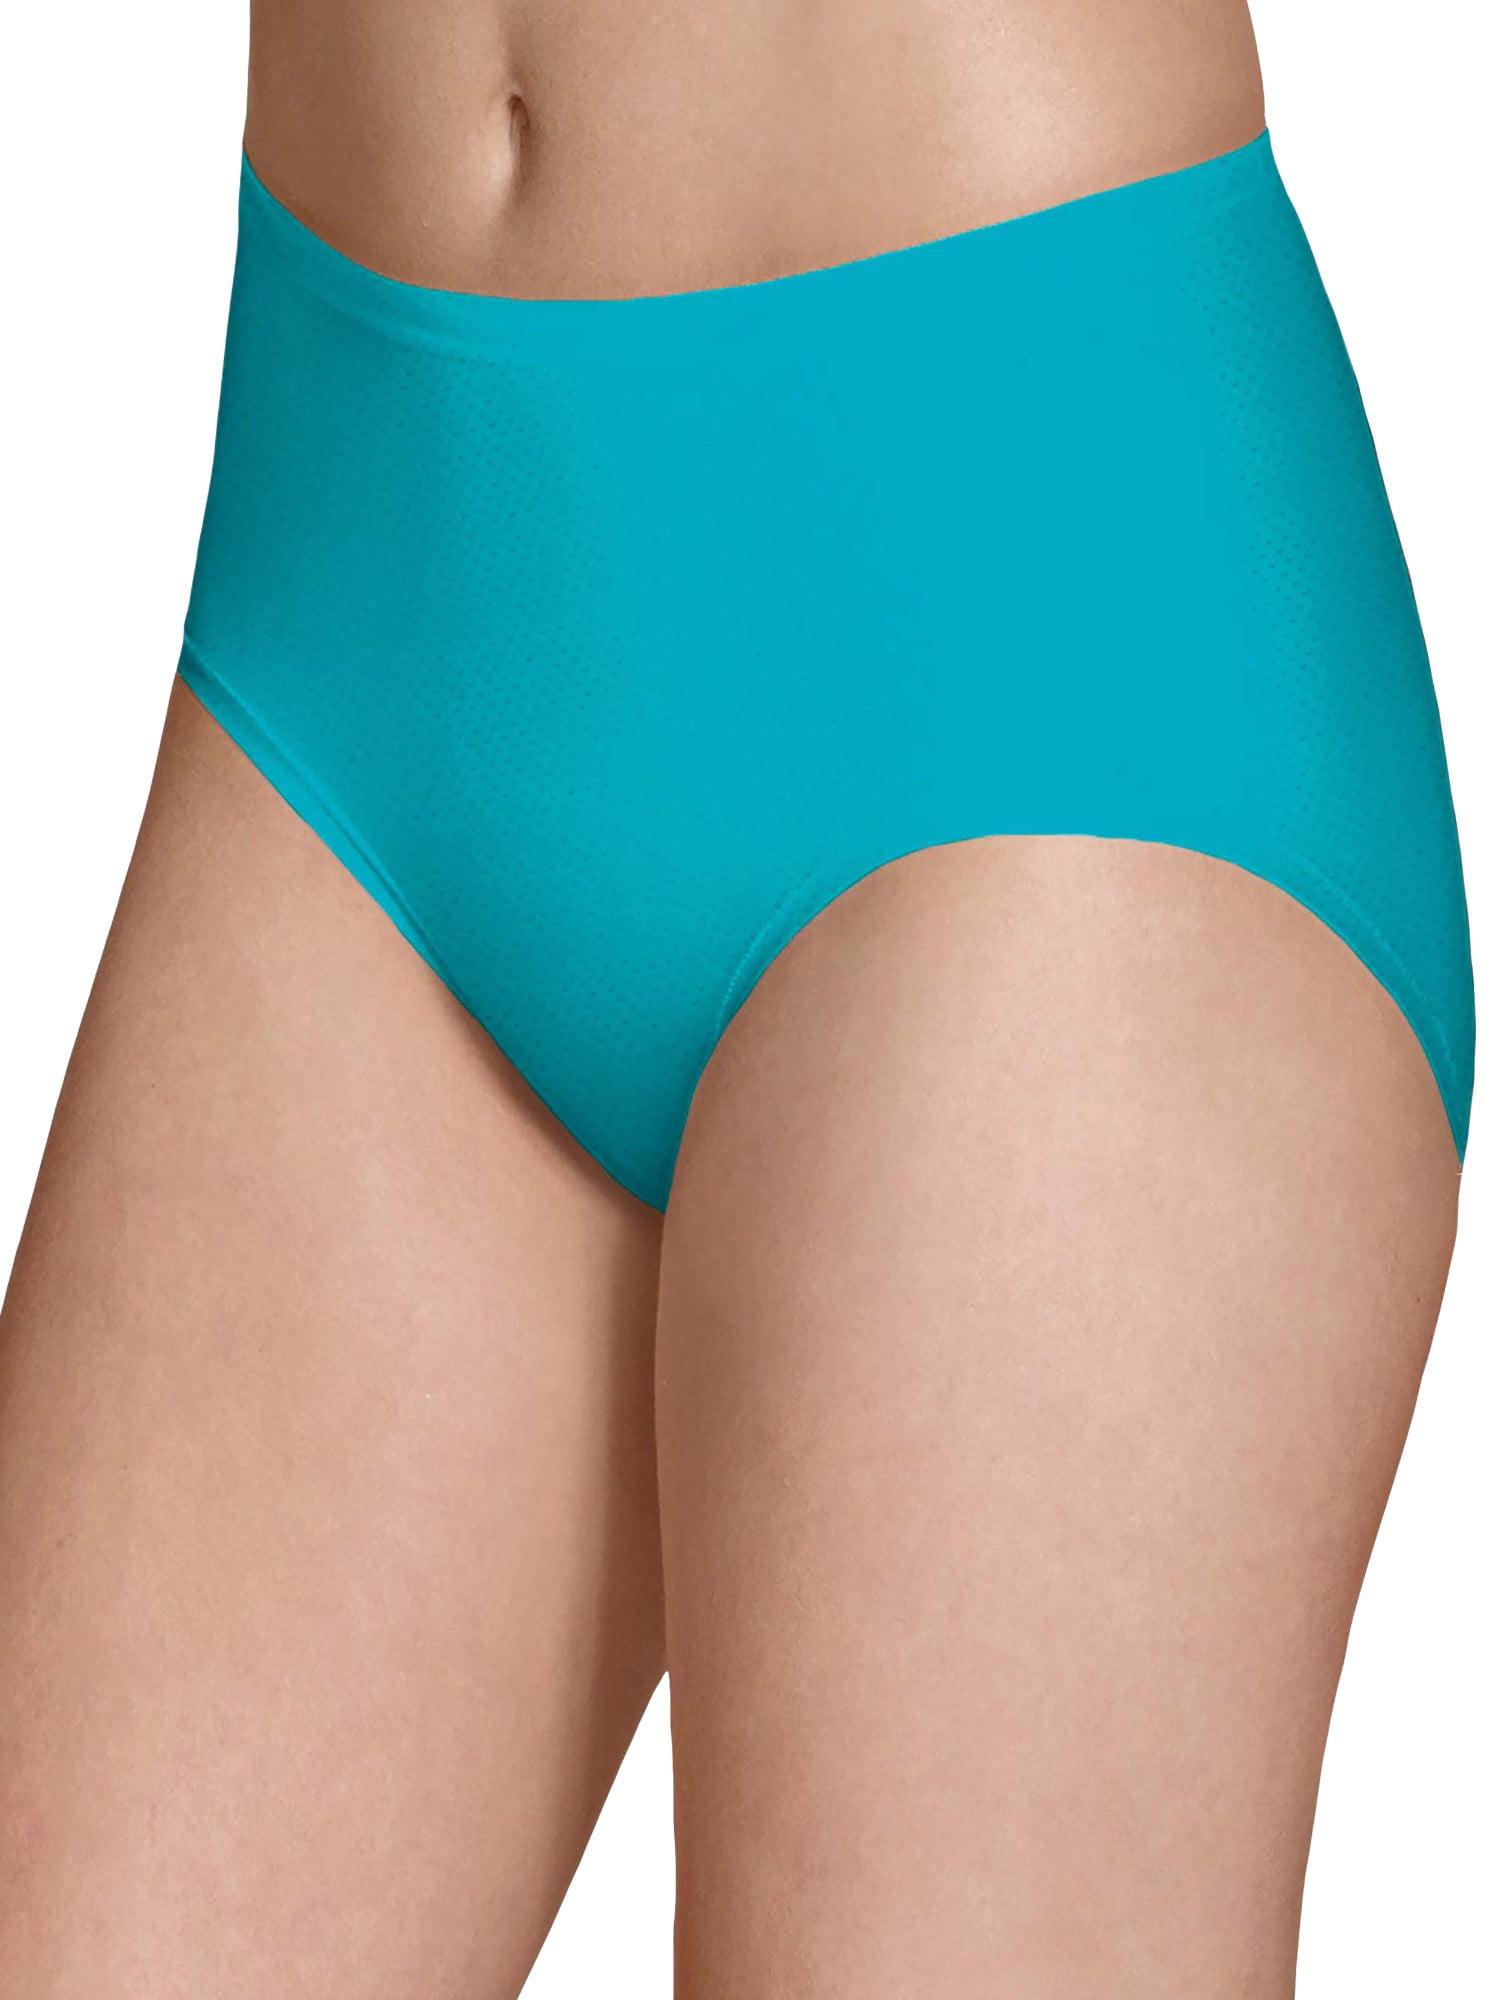 Comfy Full Coverage Underwear Womens Goldfish and Waves Bikini Briefs